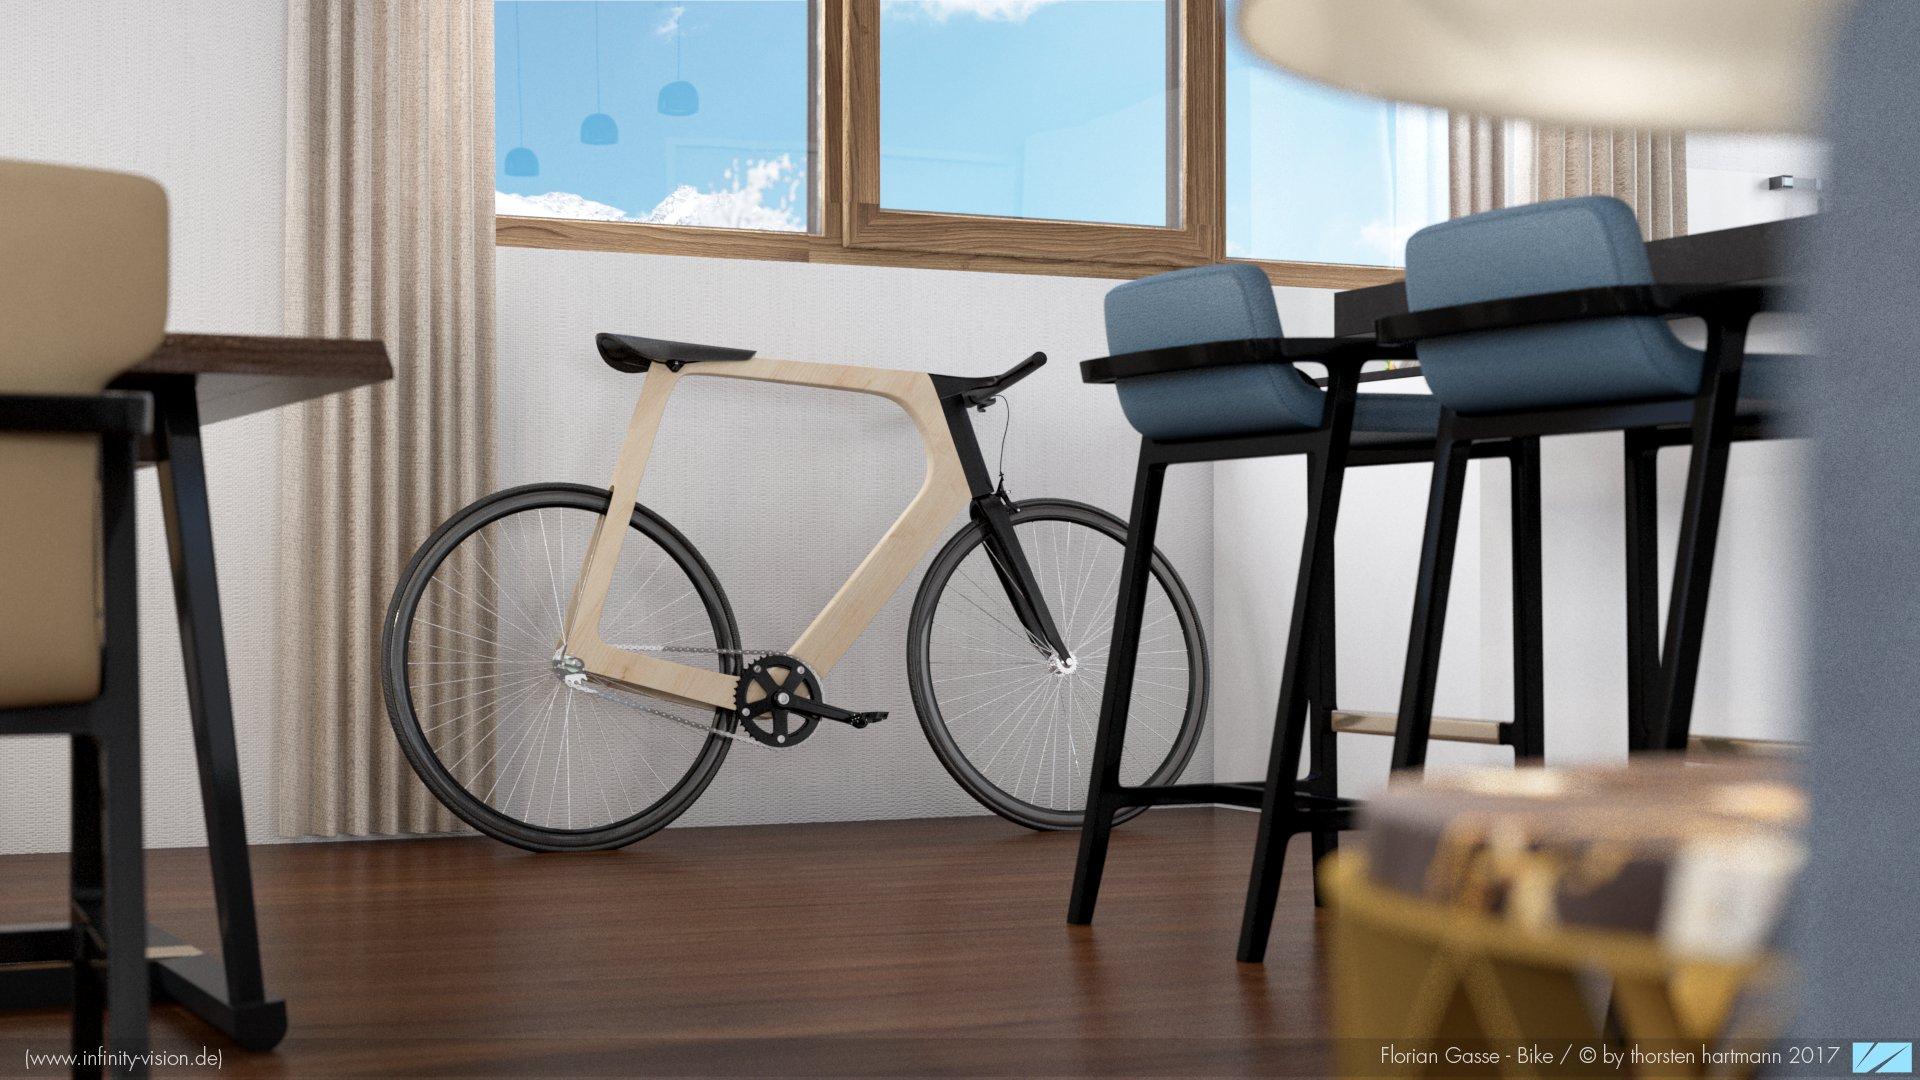 Florian Gasse / Bike